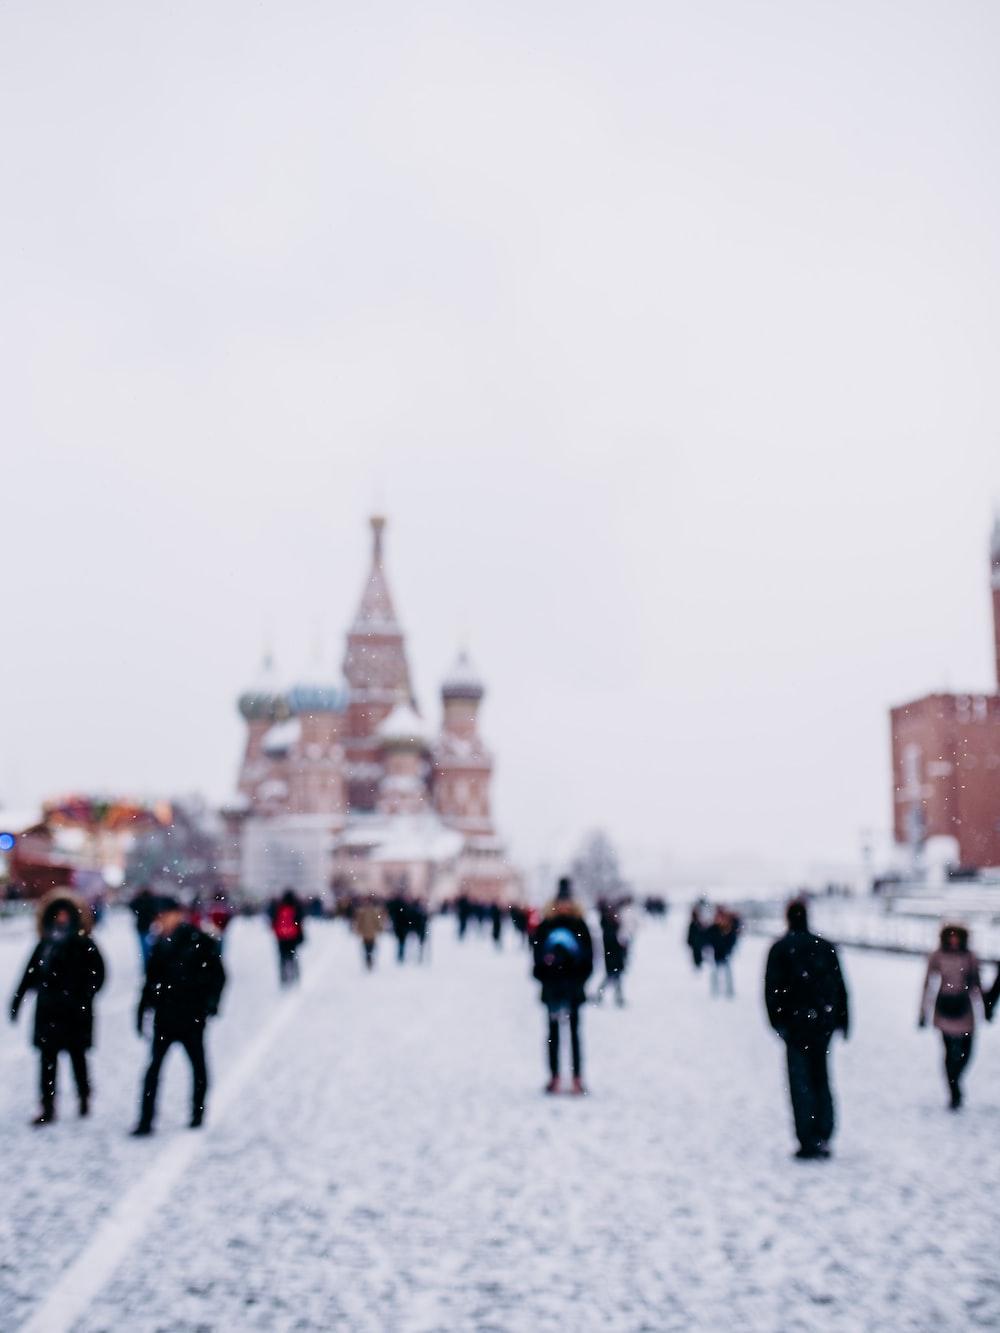 people walking near Saint Basil's Cathedral